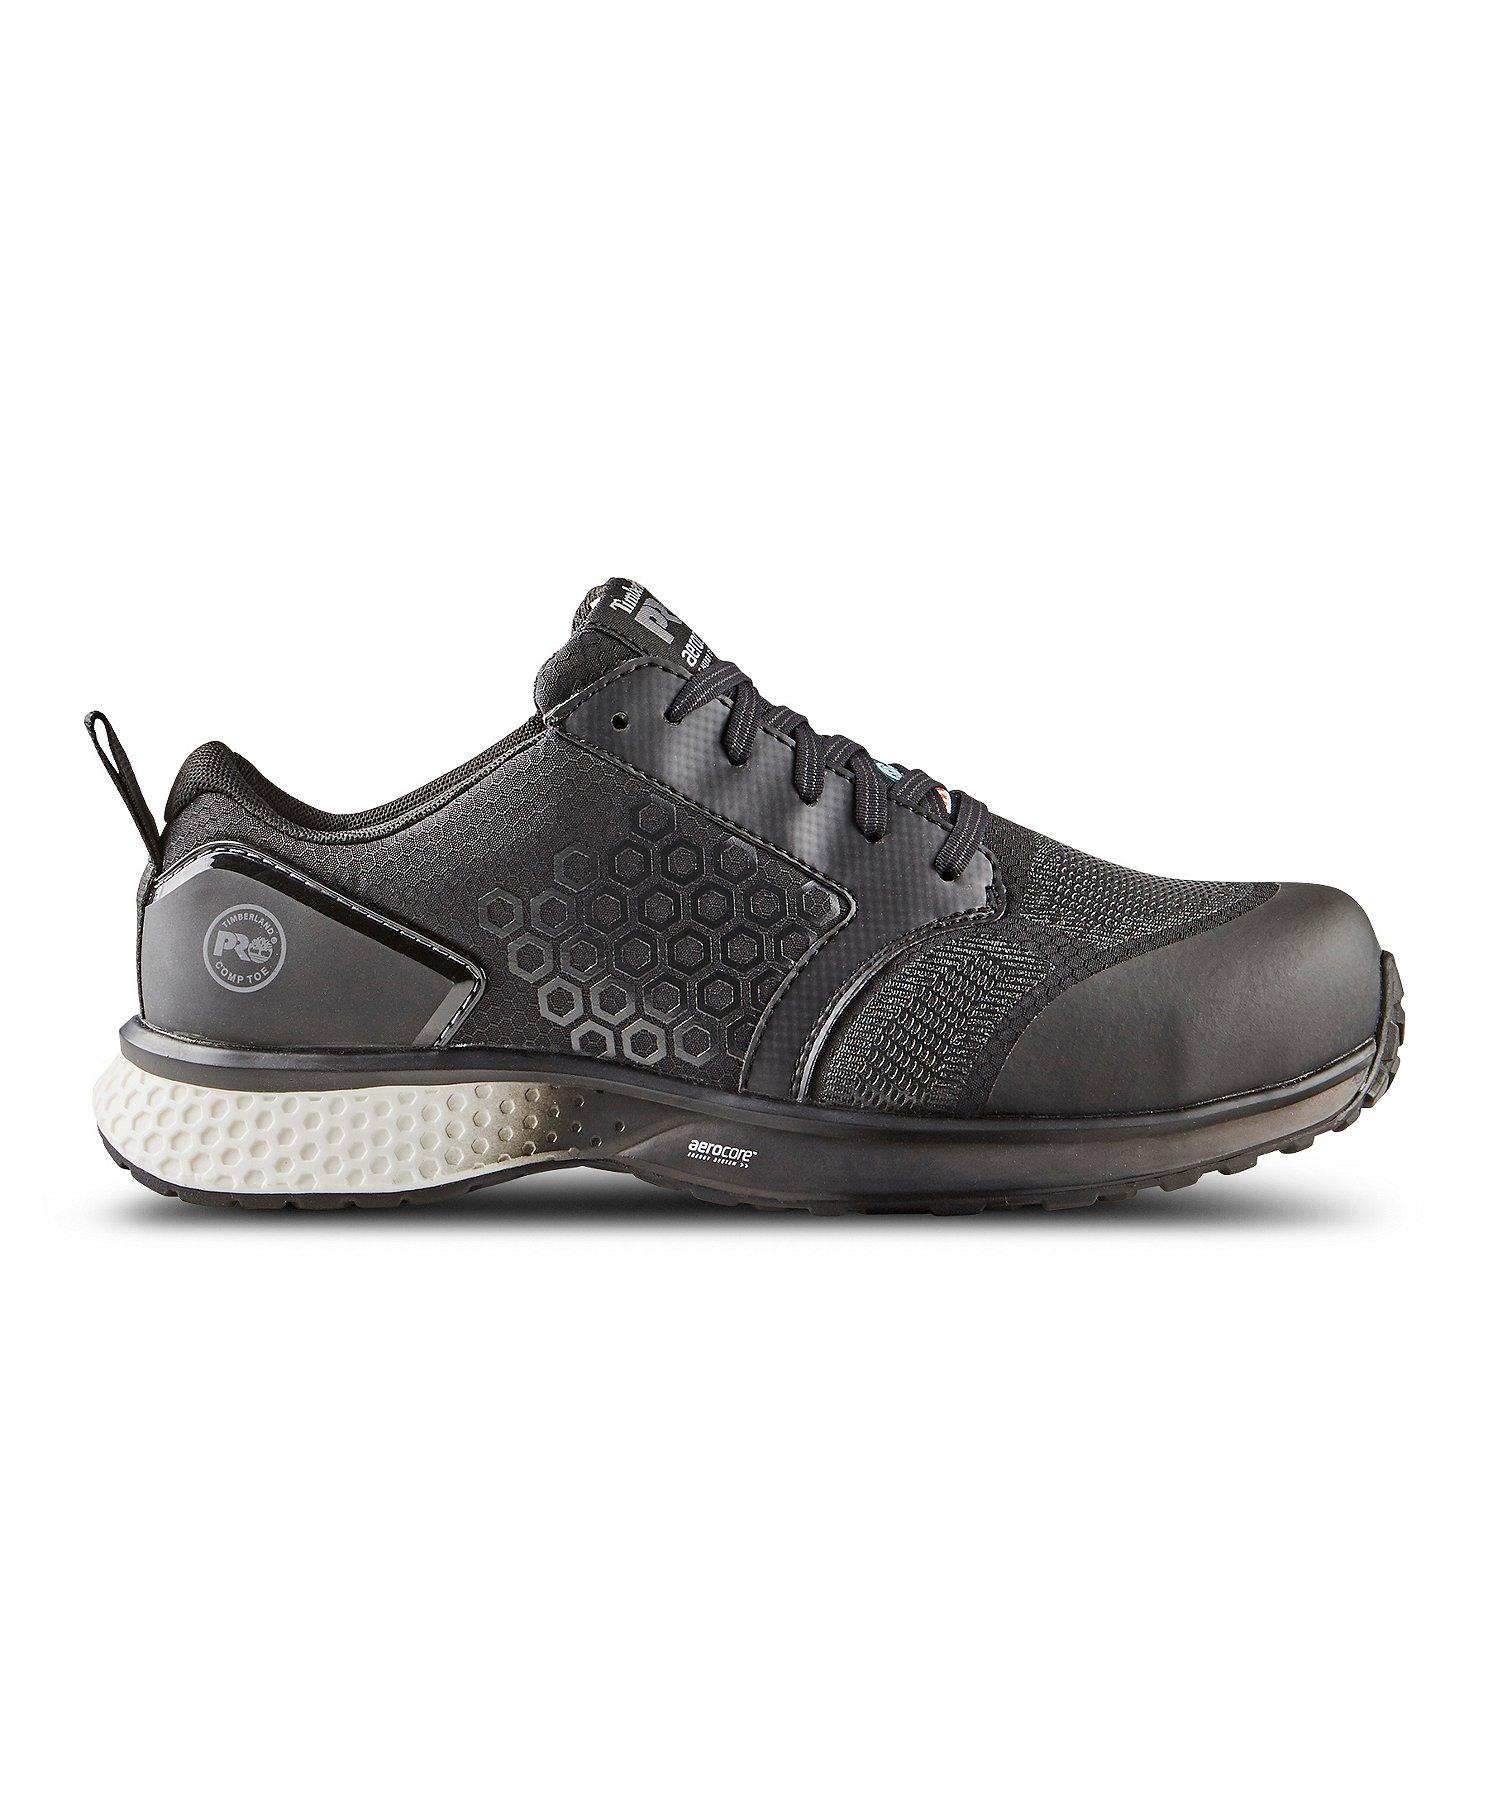 chaussure securite timberland pro basse